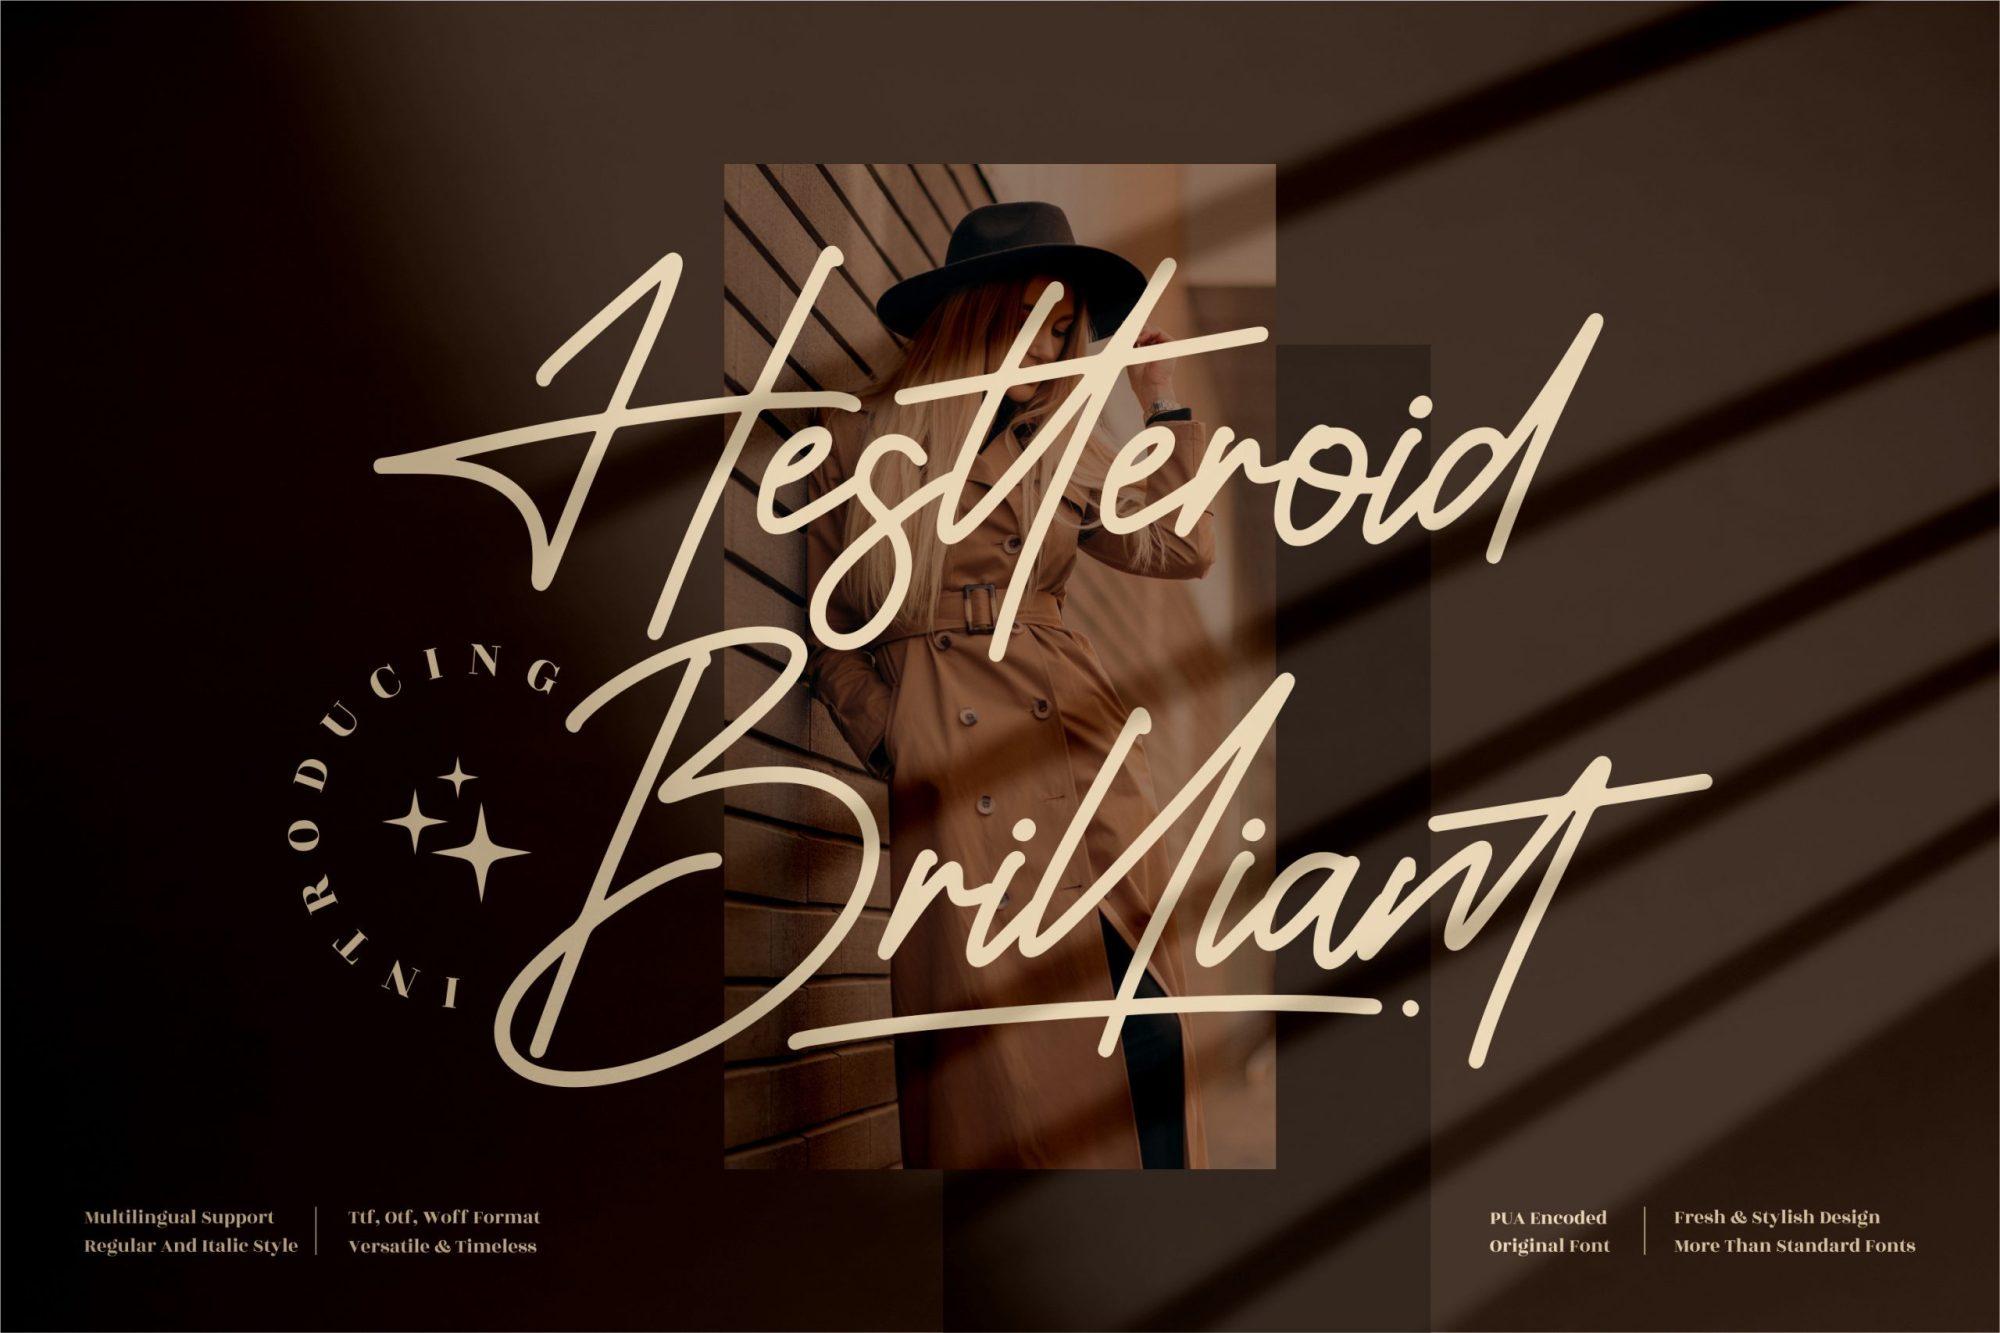 Hestteroid-Brilliant-Font